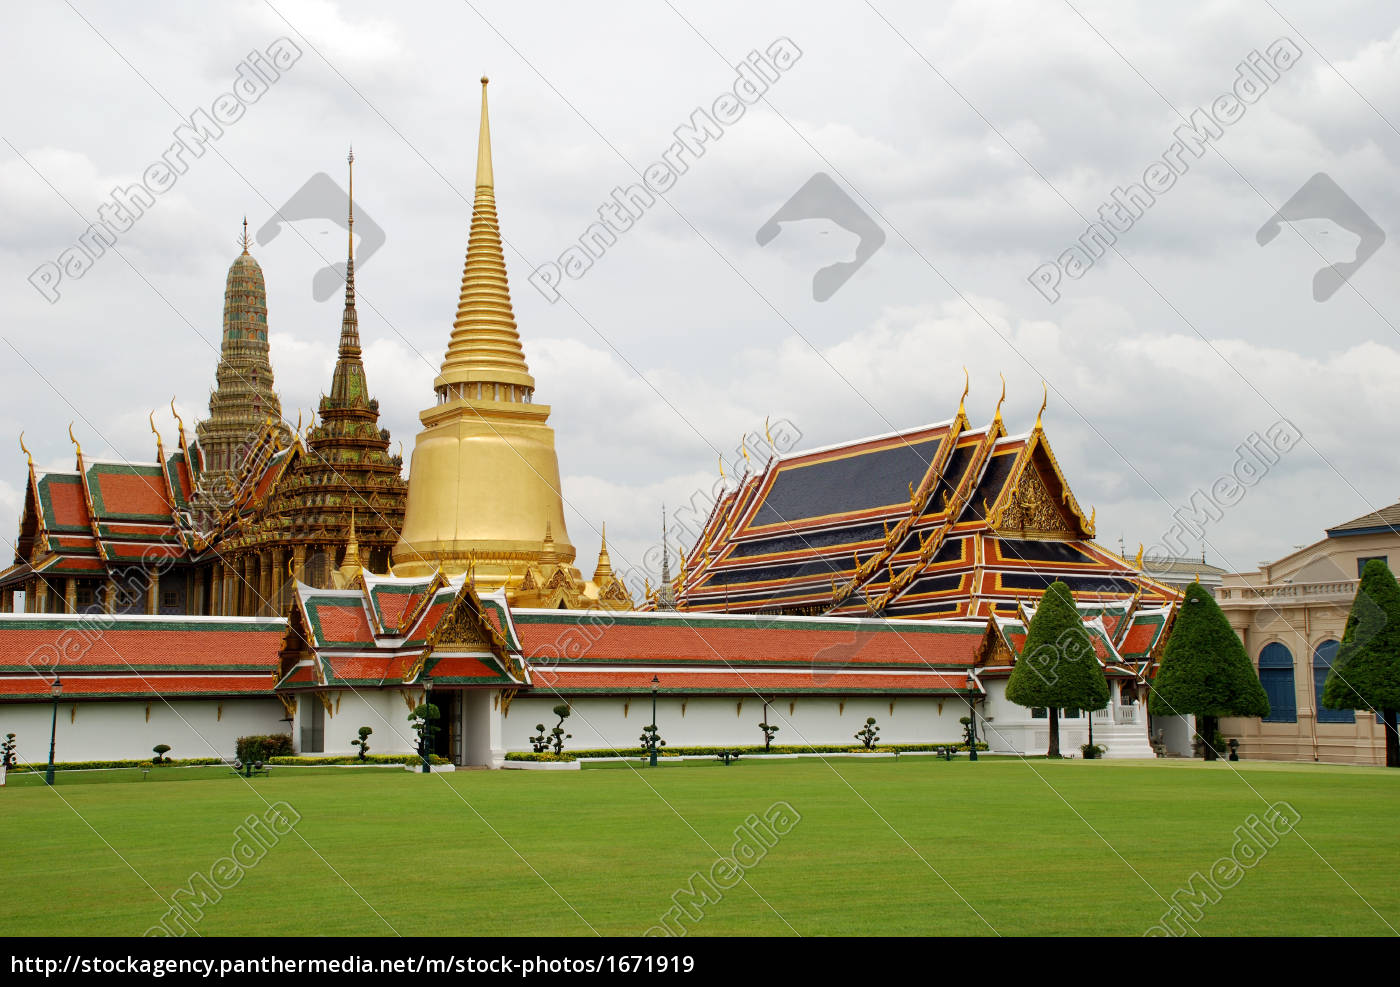 grand, place, bangkok, royal, palace, asia - 1671919